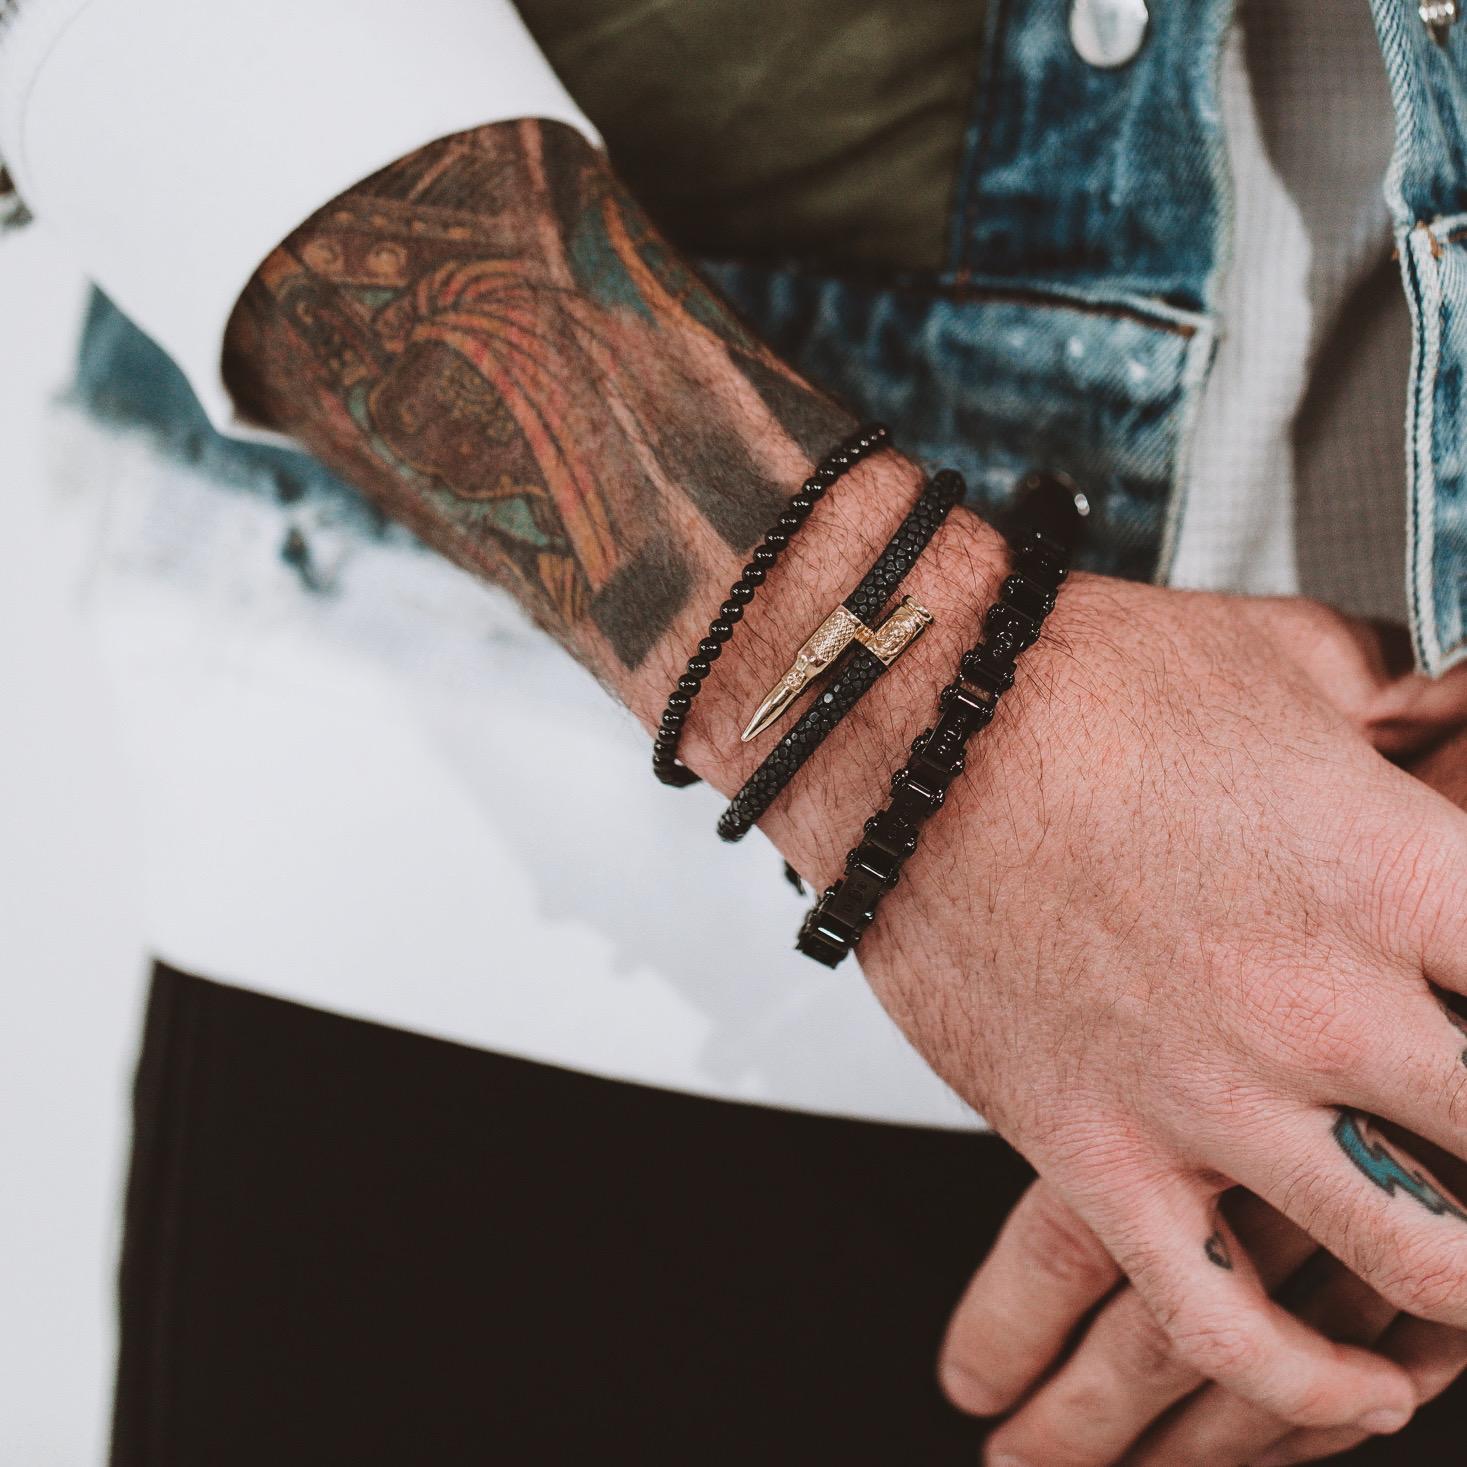 Man wearing Men's Black PVD 9.5MM Bicycle Bracelet and other bracelets